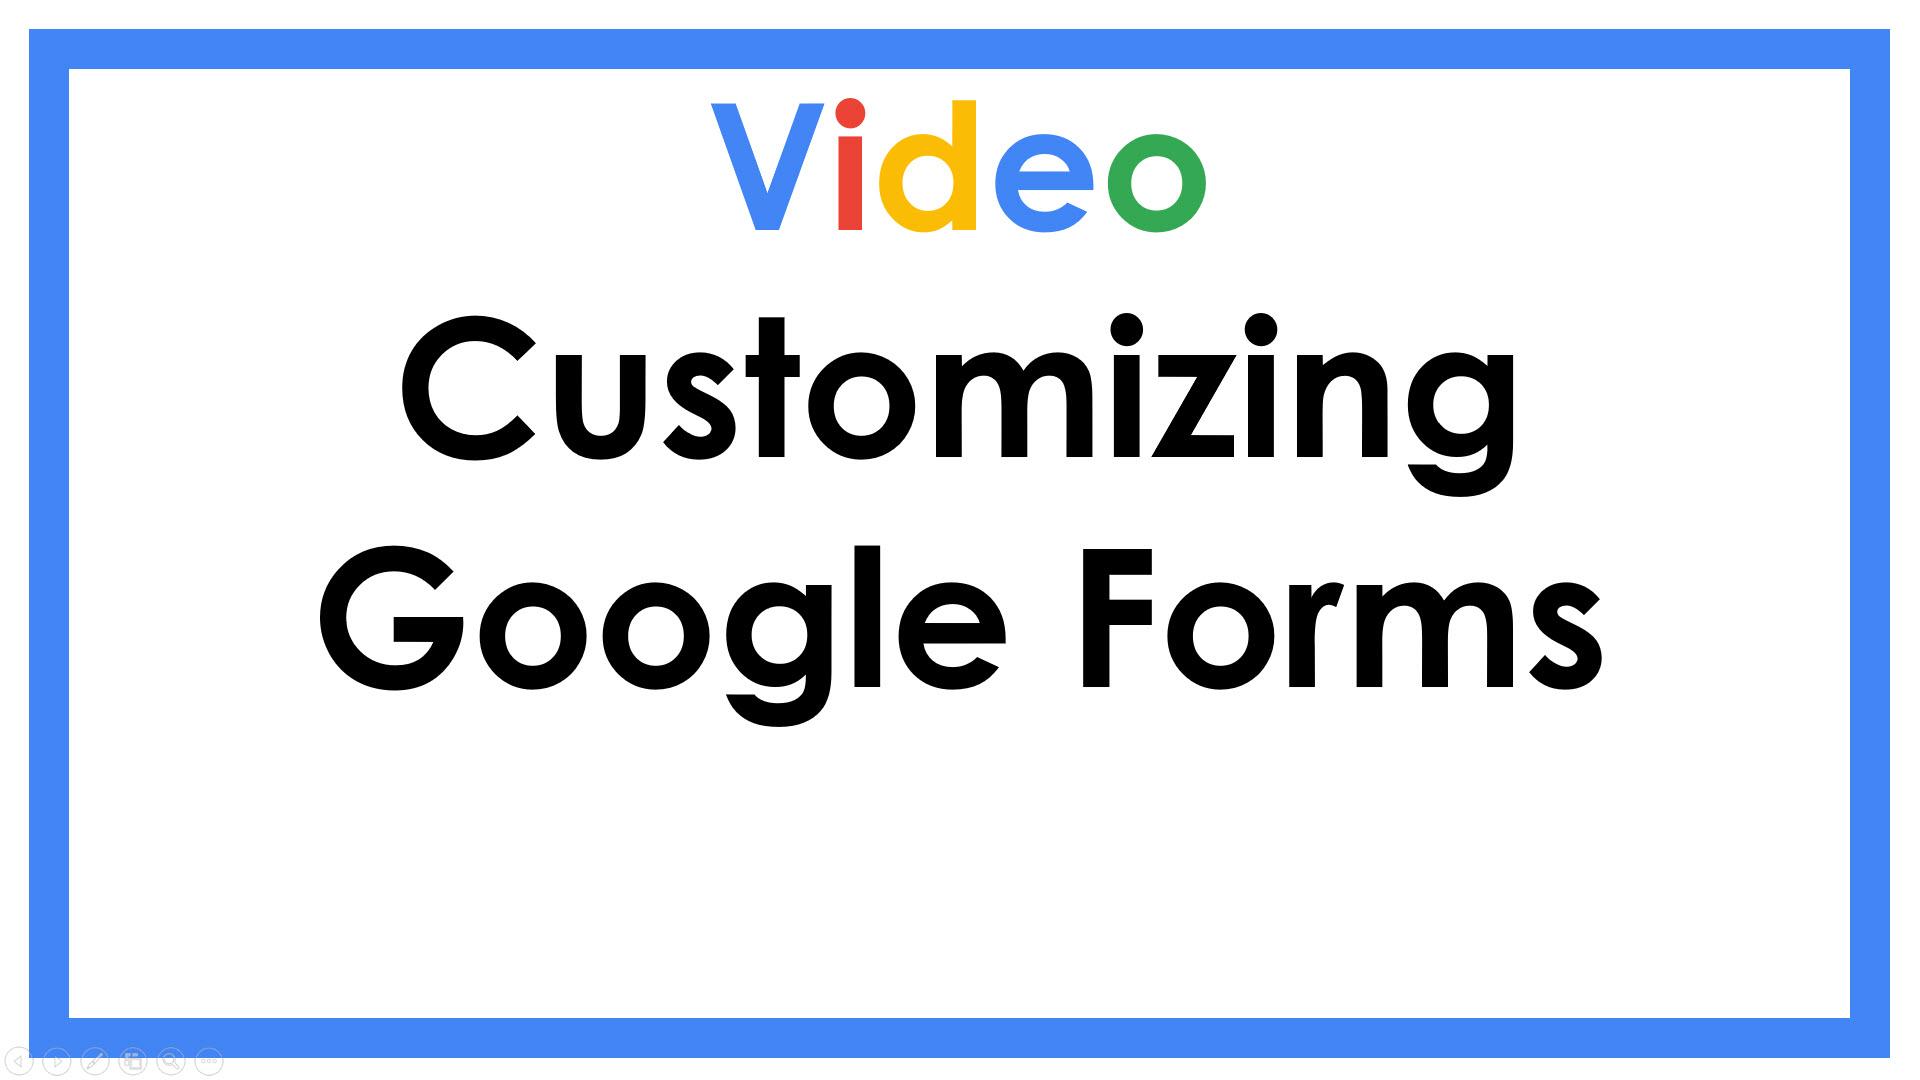 Customizing Google Forms